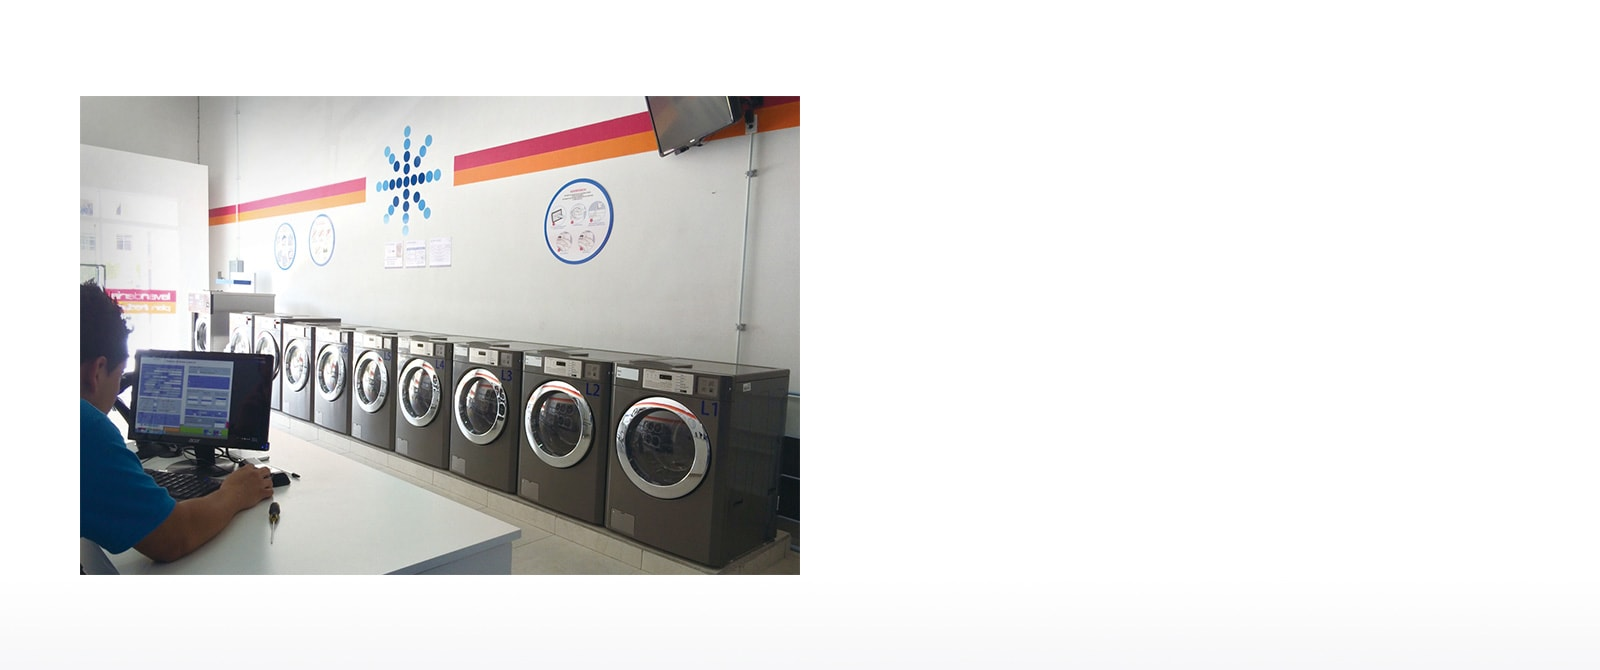 Coin laundry industries commercial laundry business lg global clcoinlaundry051461557963705 solutioingenieria Gallery